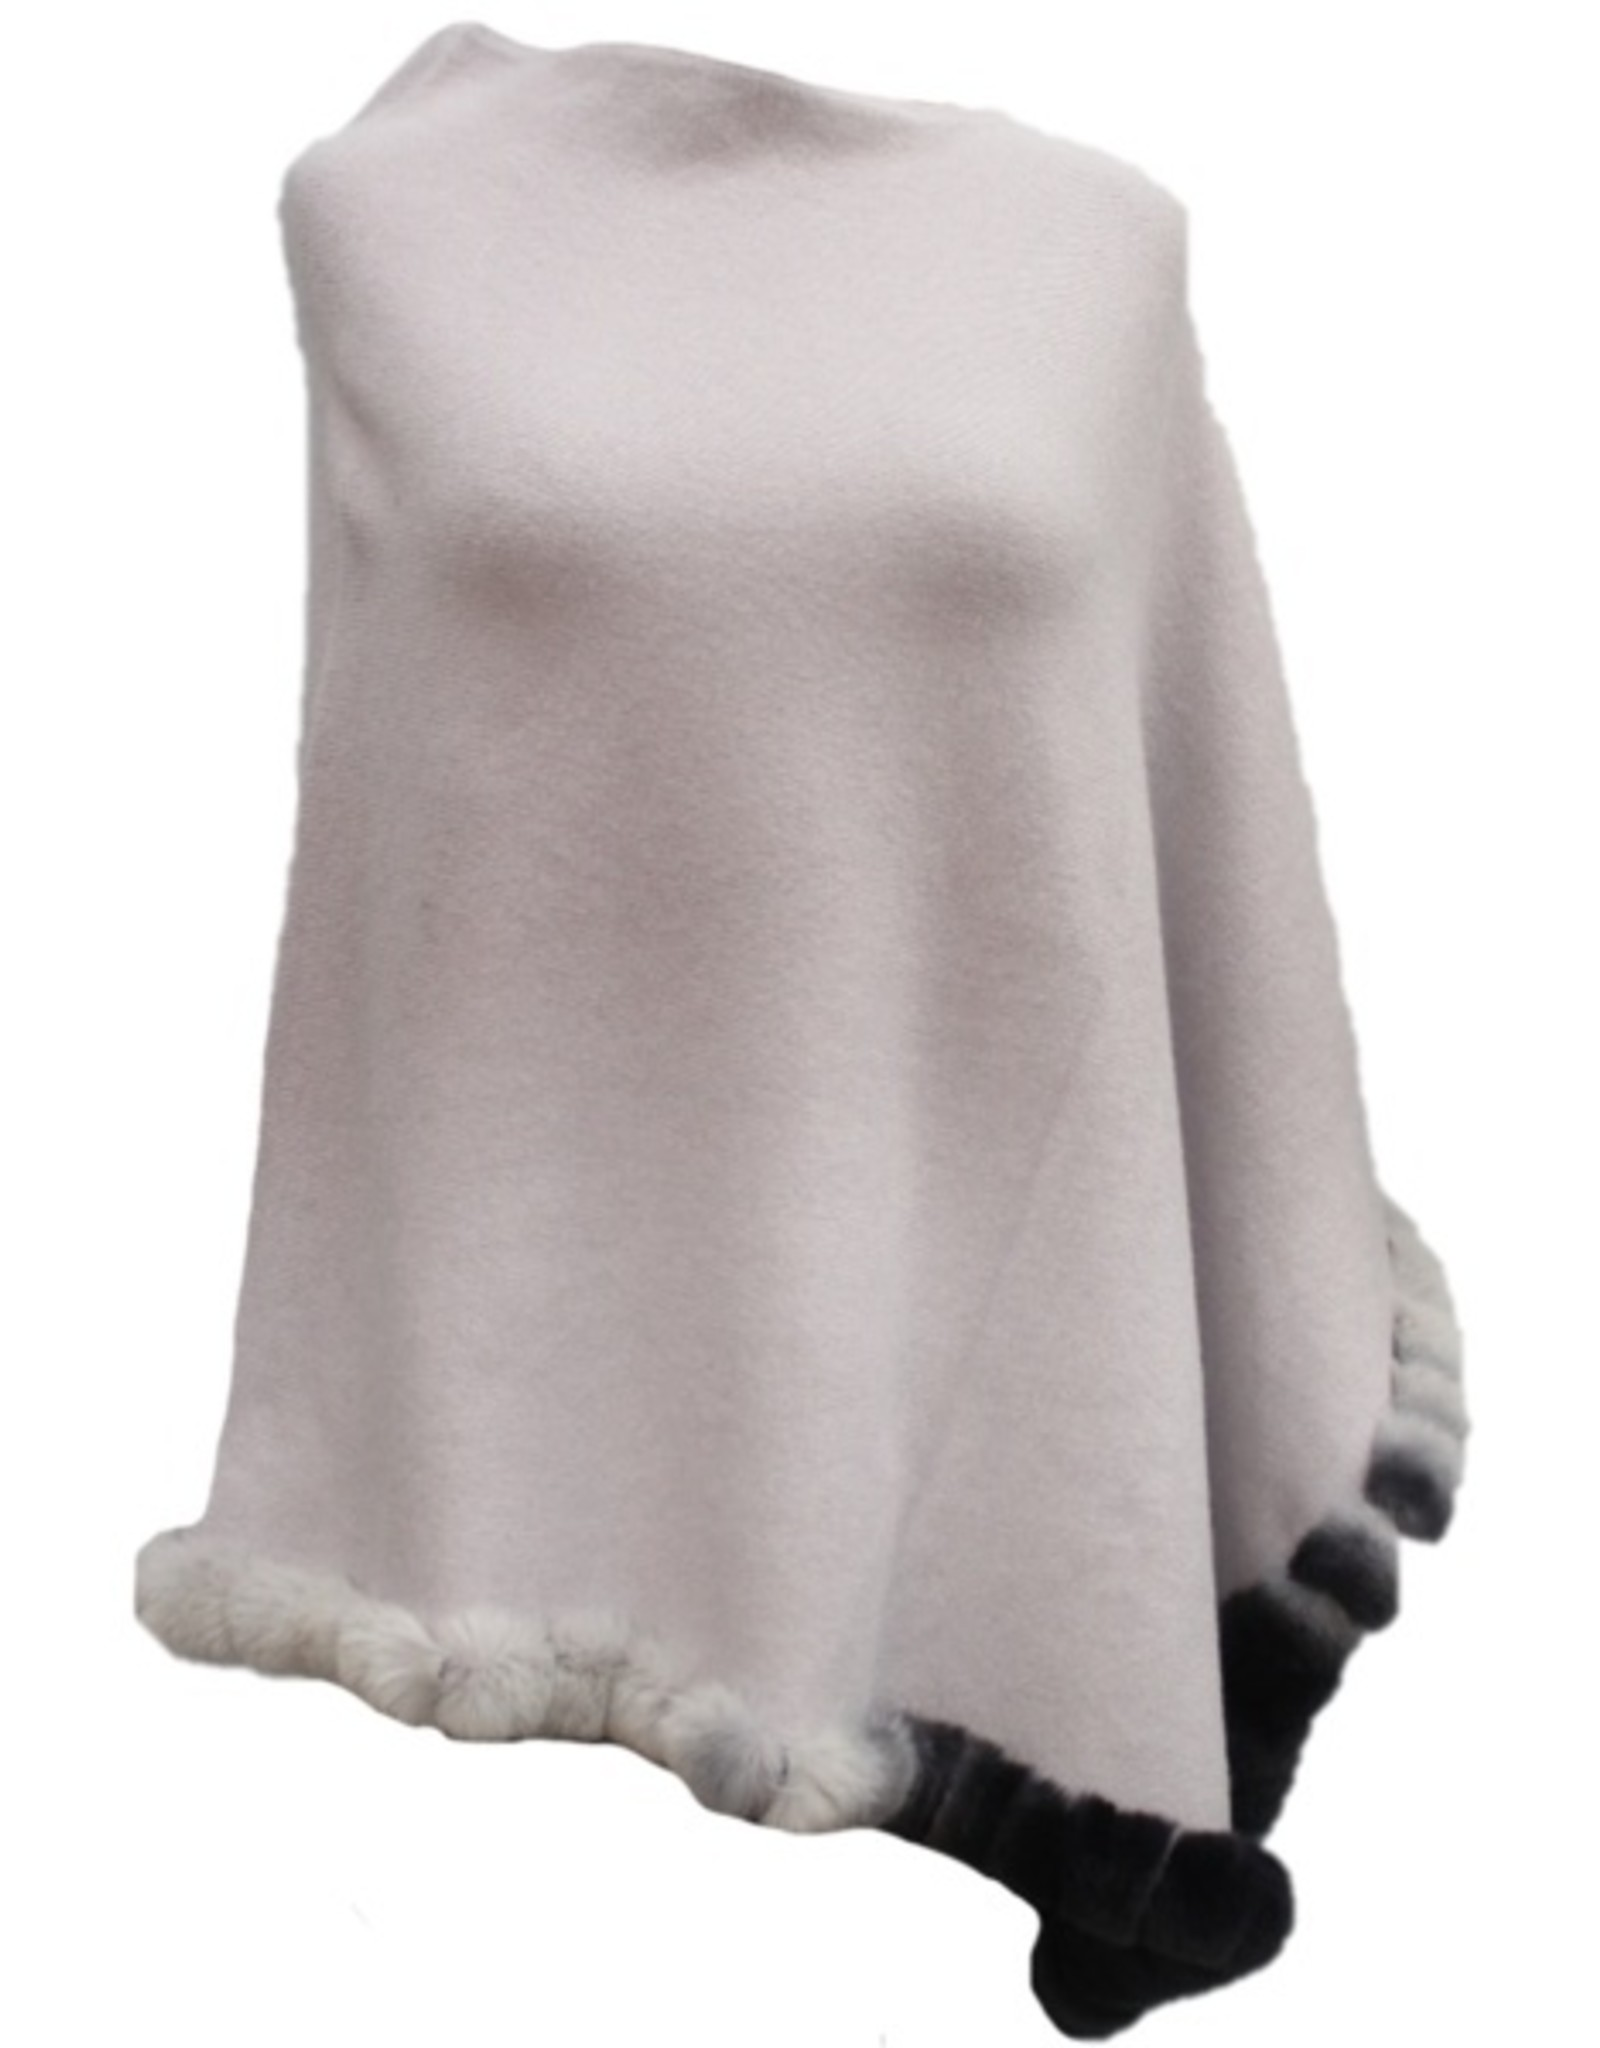 La Fiorentina VCExclusives/ Poncho Ombre with Fur